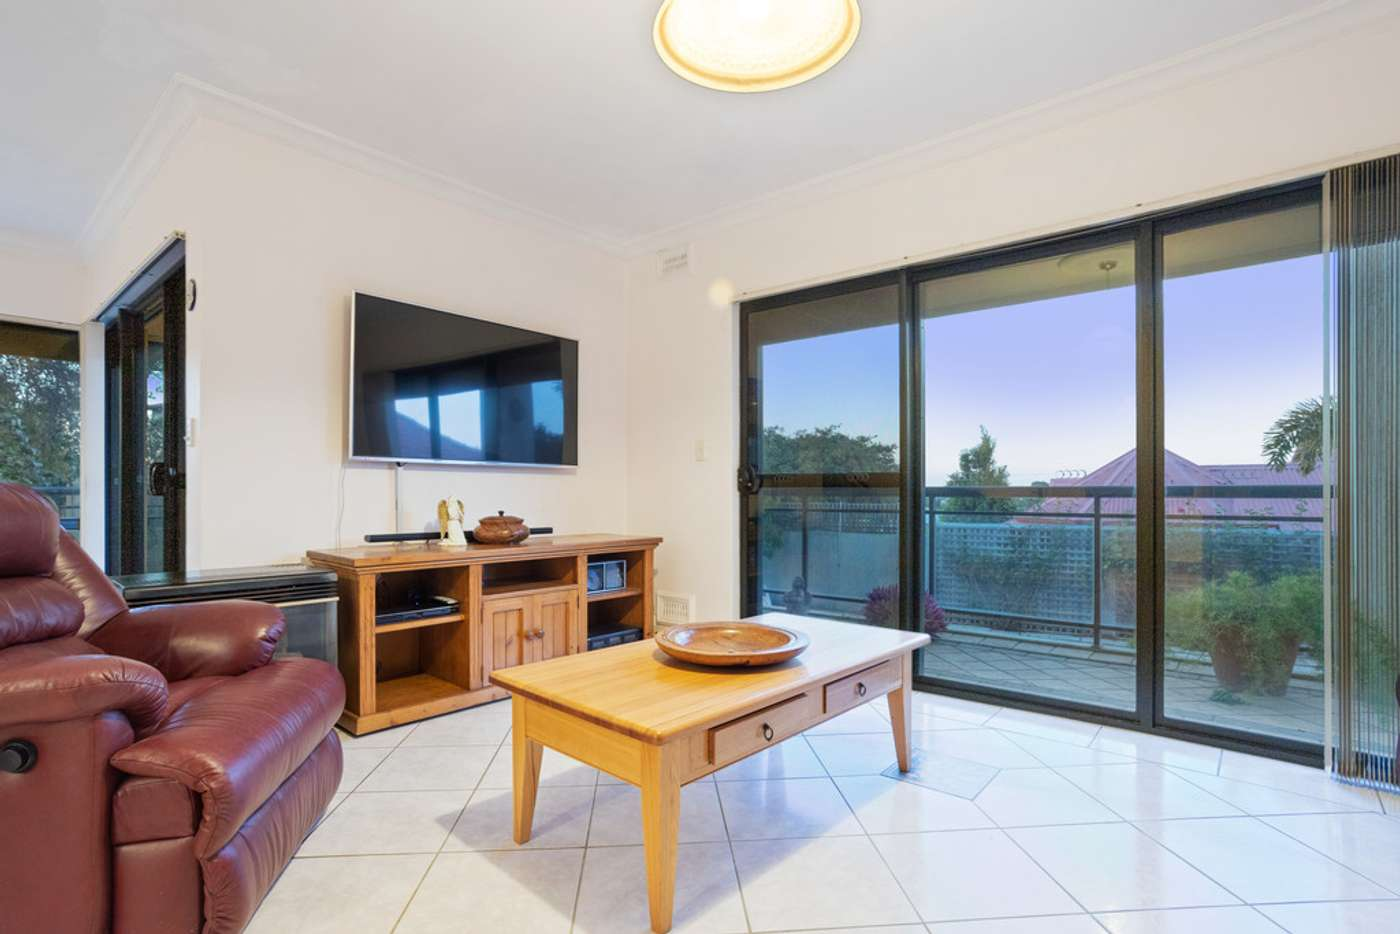 Seventh view of Homely house listing, 9 Possum Glade, Beeliar WA 6164